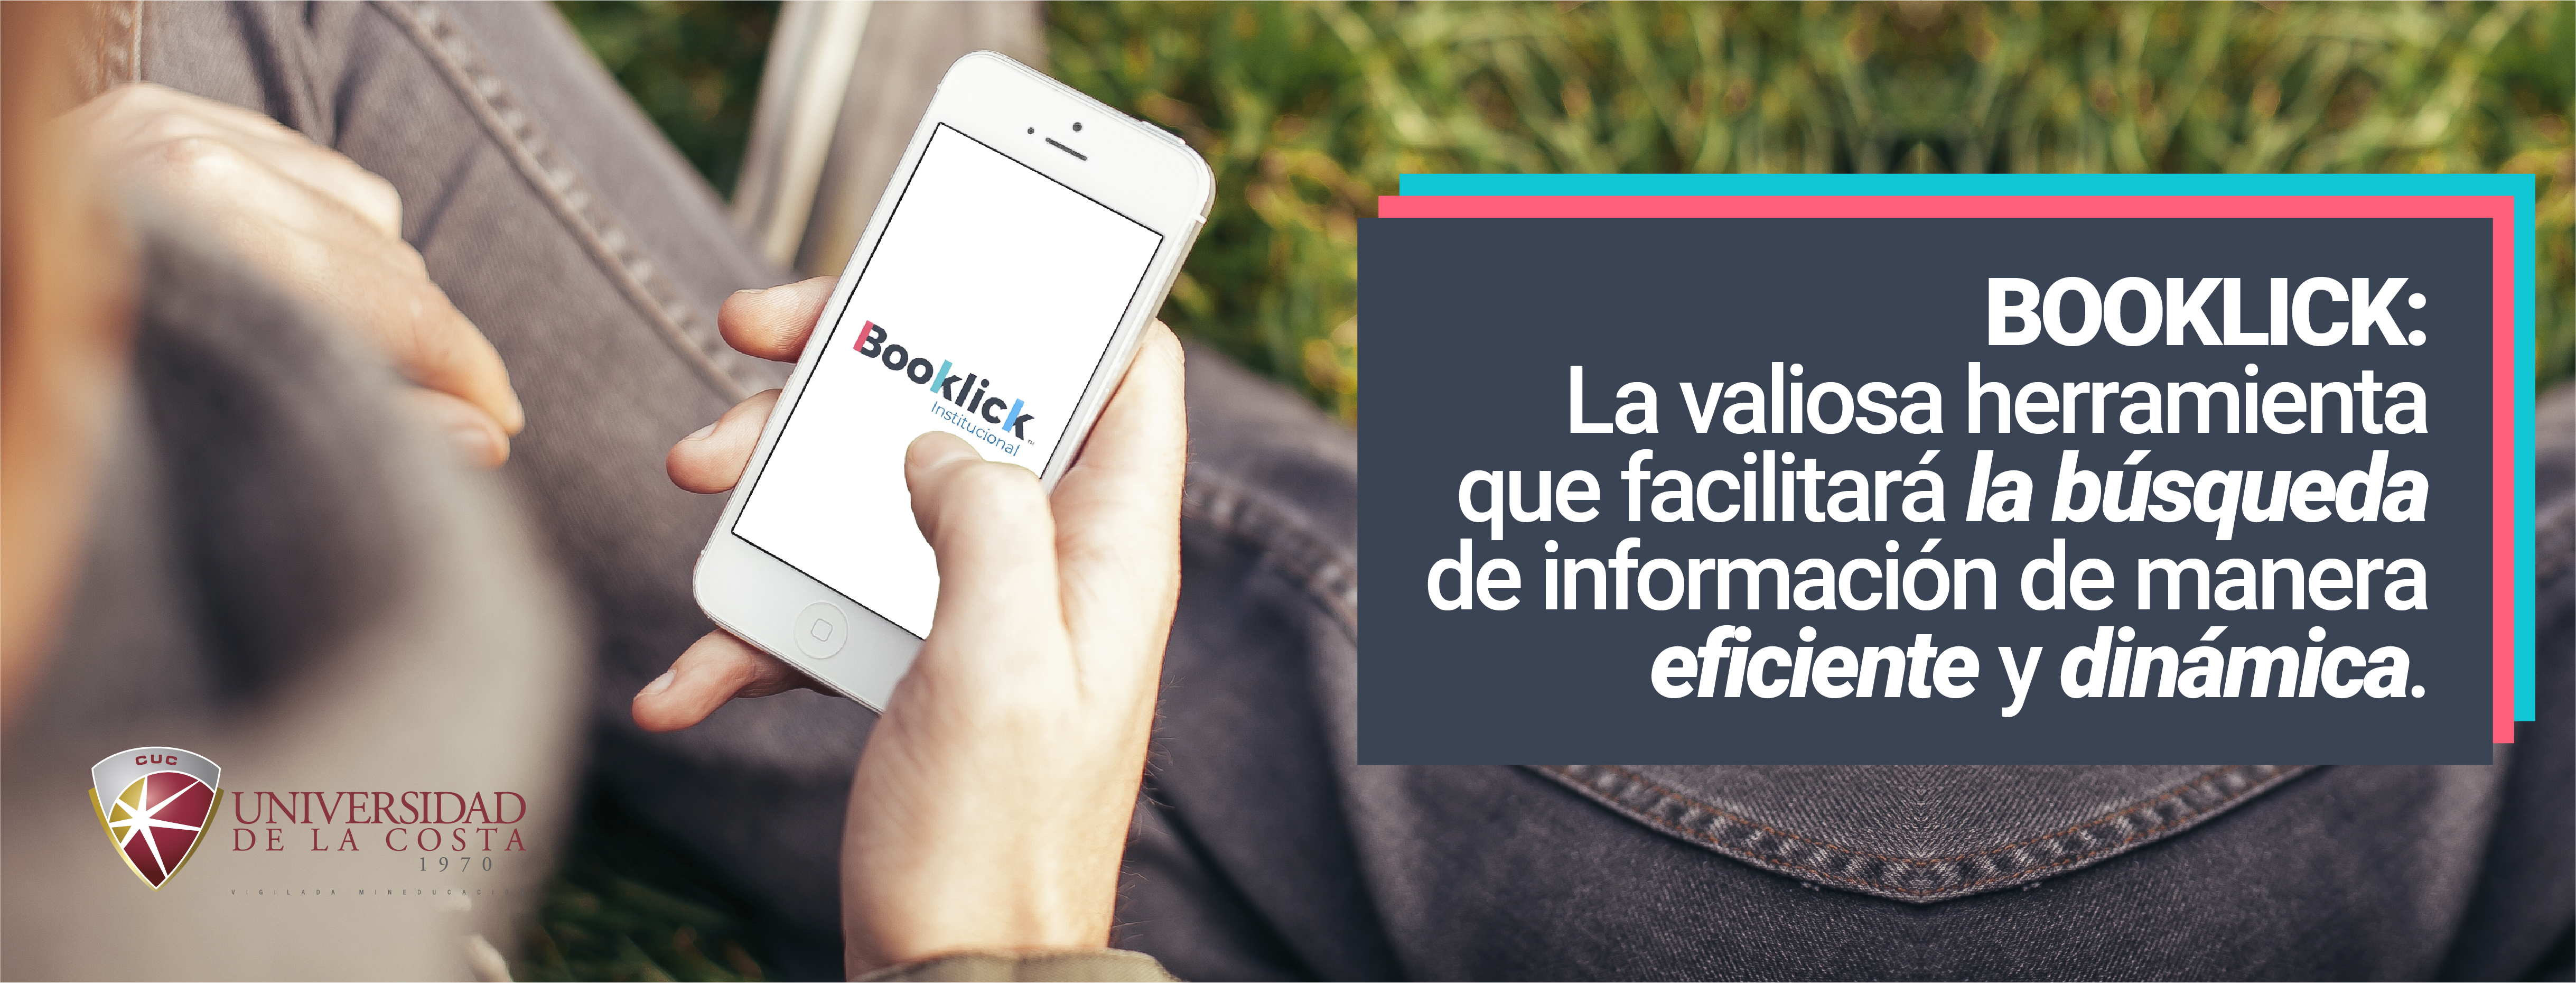 Booklick Banner